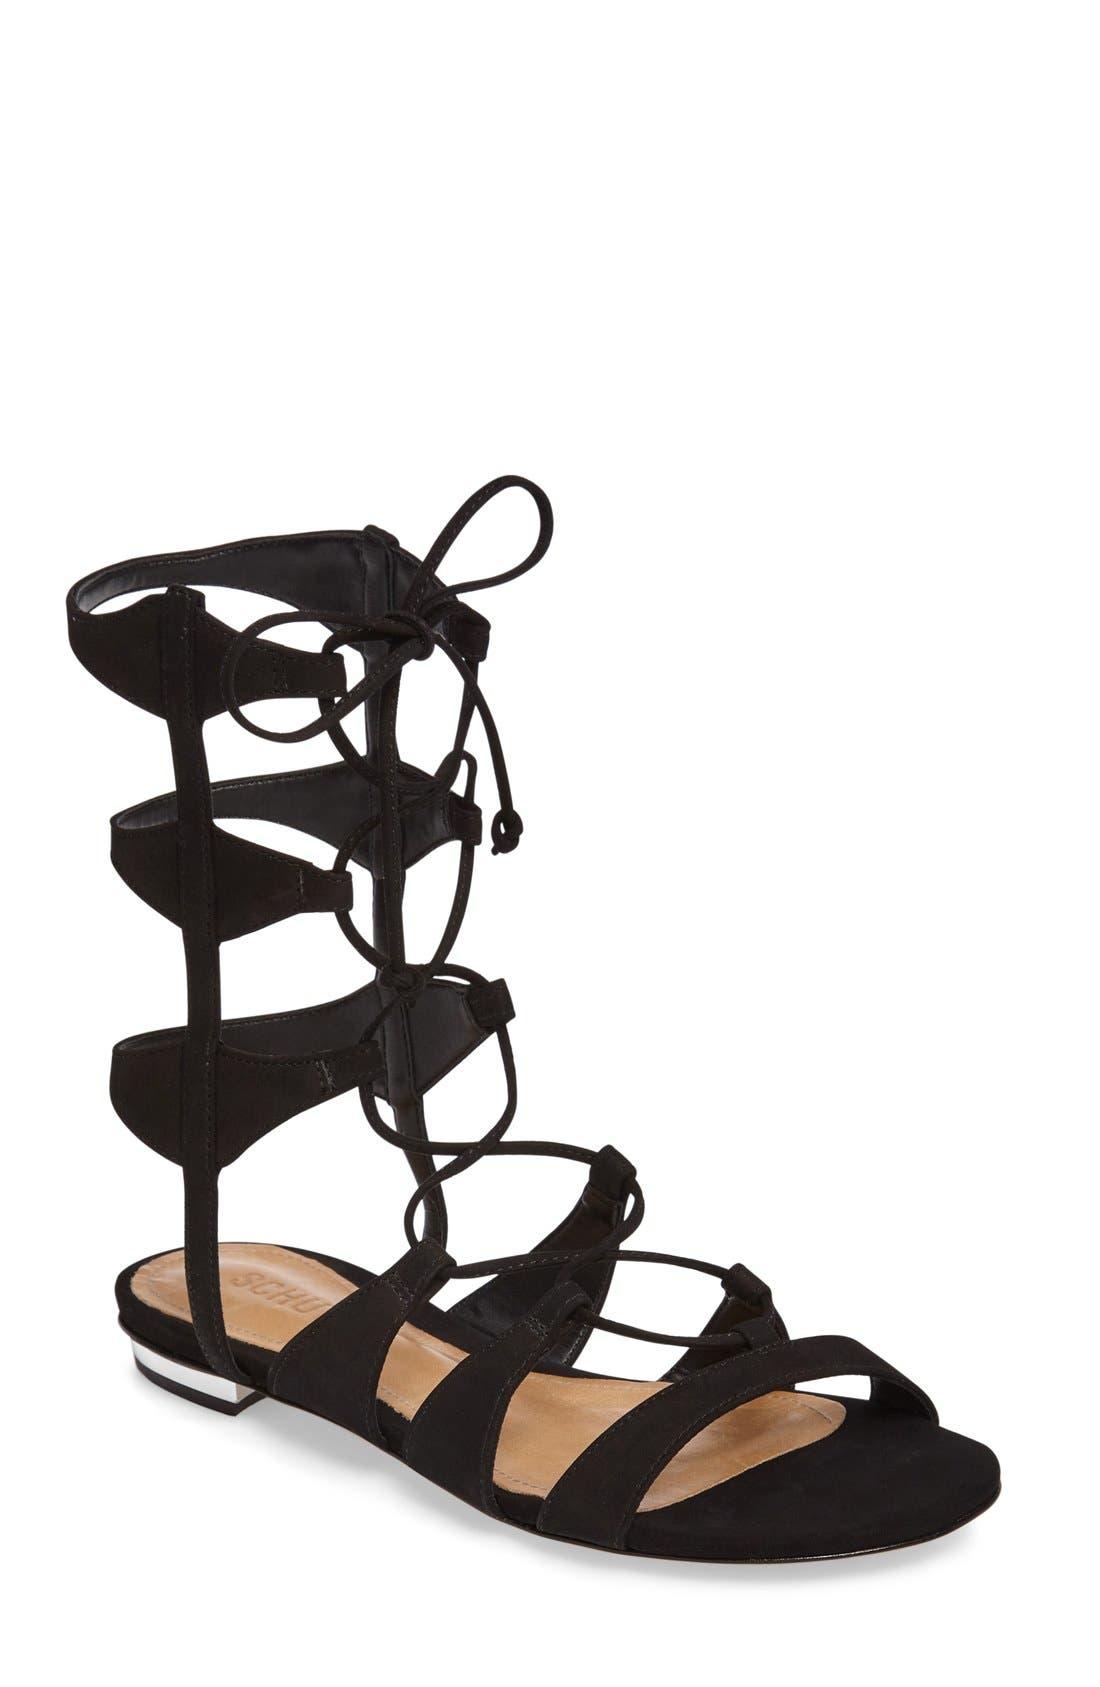 Erlina Lace-Up Sandal,                         Main,                         color, 004